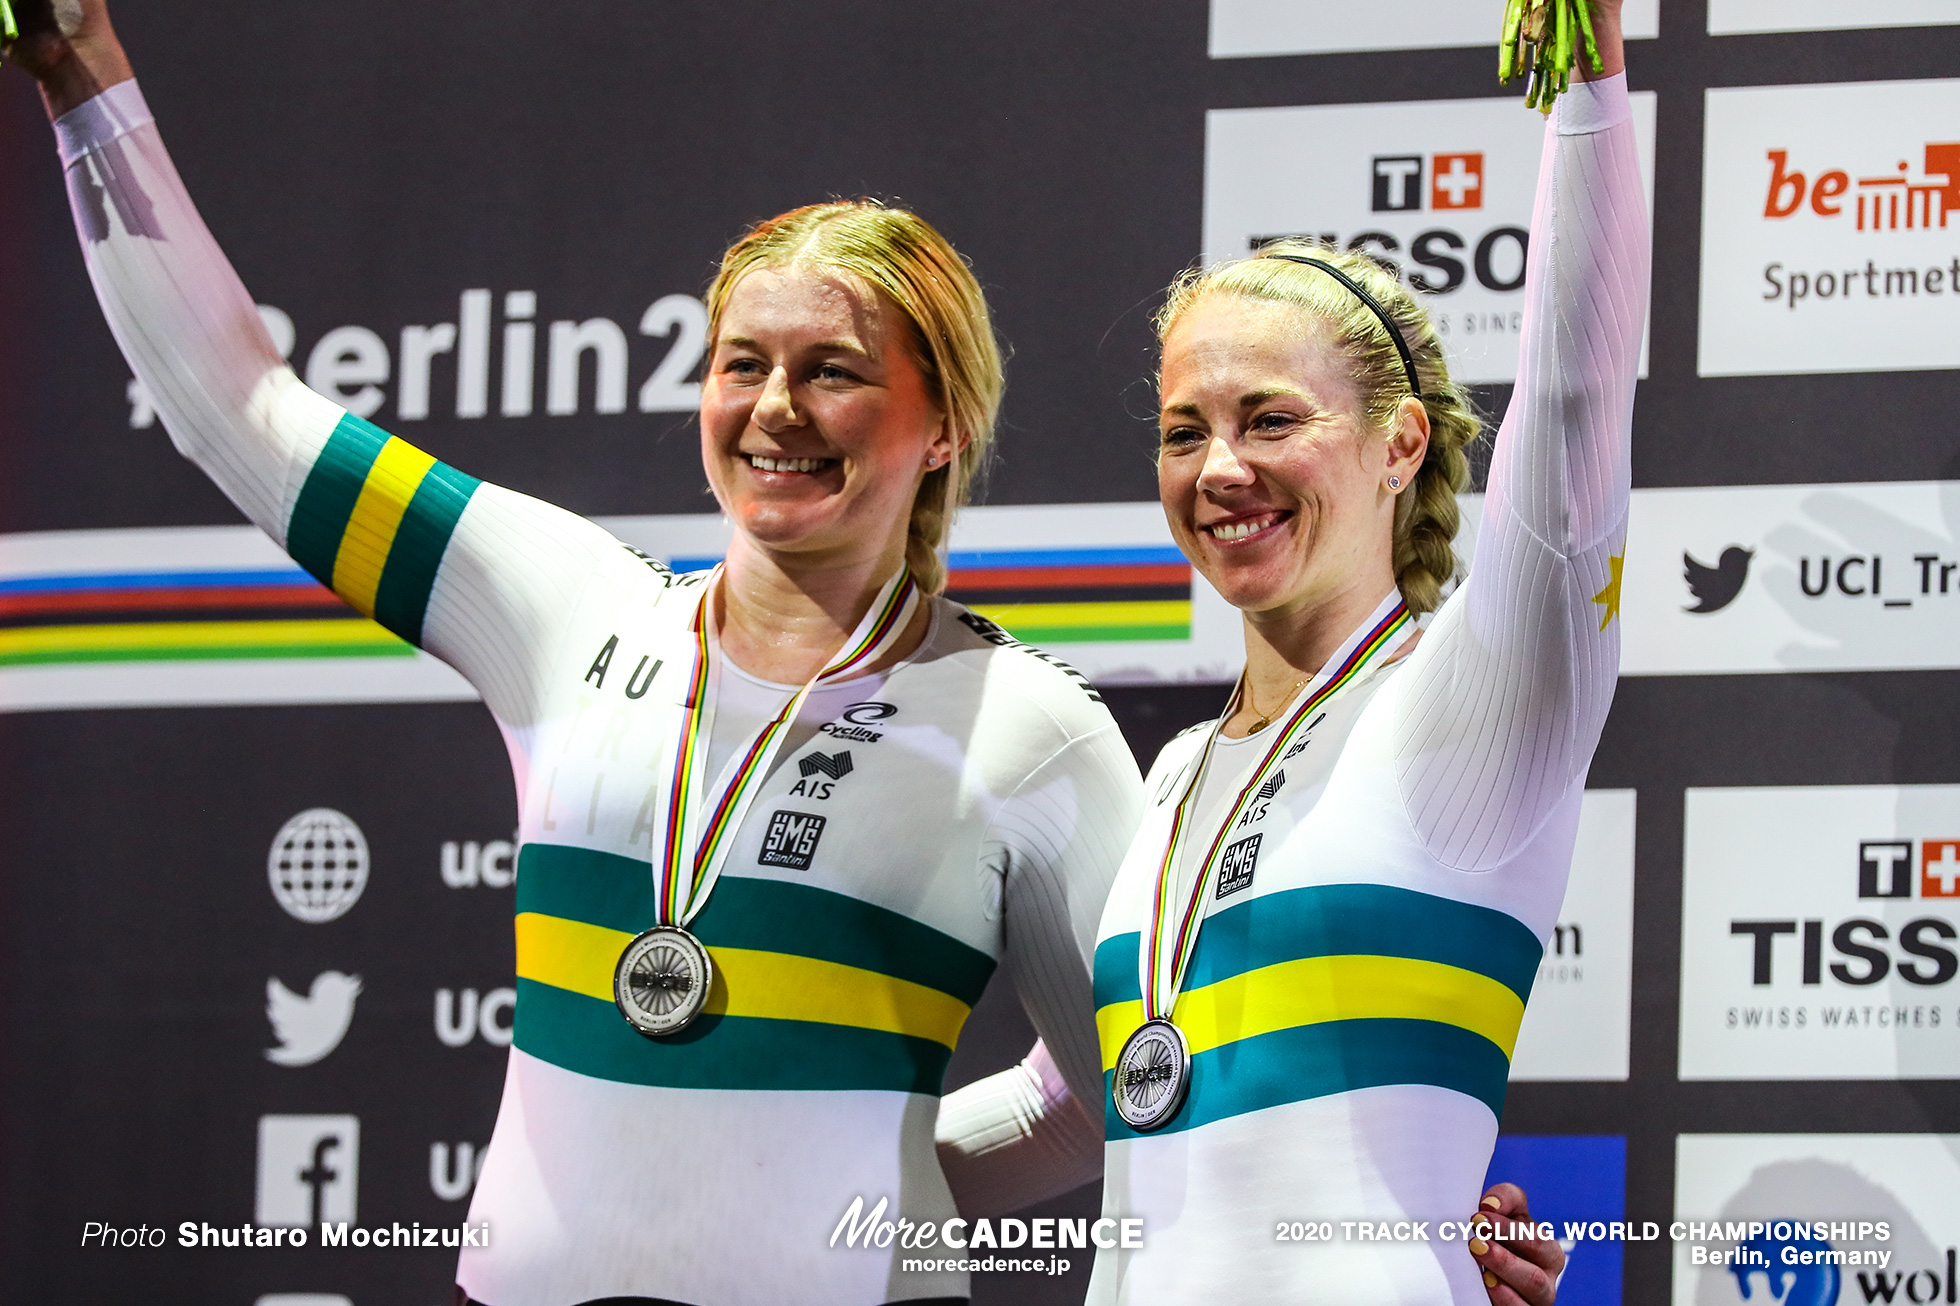 Women's Team Sprint / 2020 Track Cycling World Championships, Kaarle McCulloch カーリー・マカラク, Stephanie Morton ステファニー・モートン